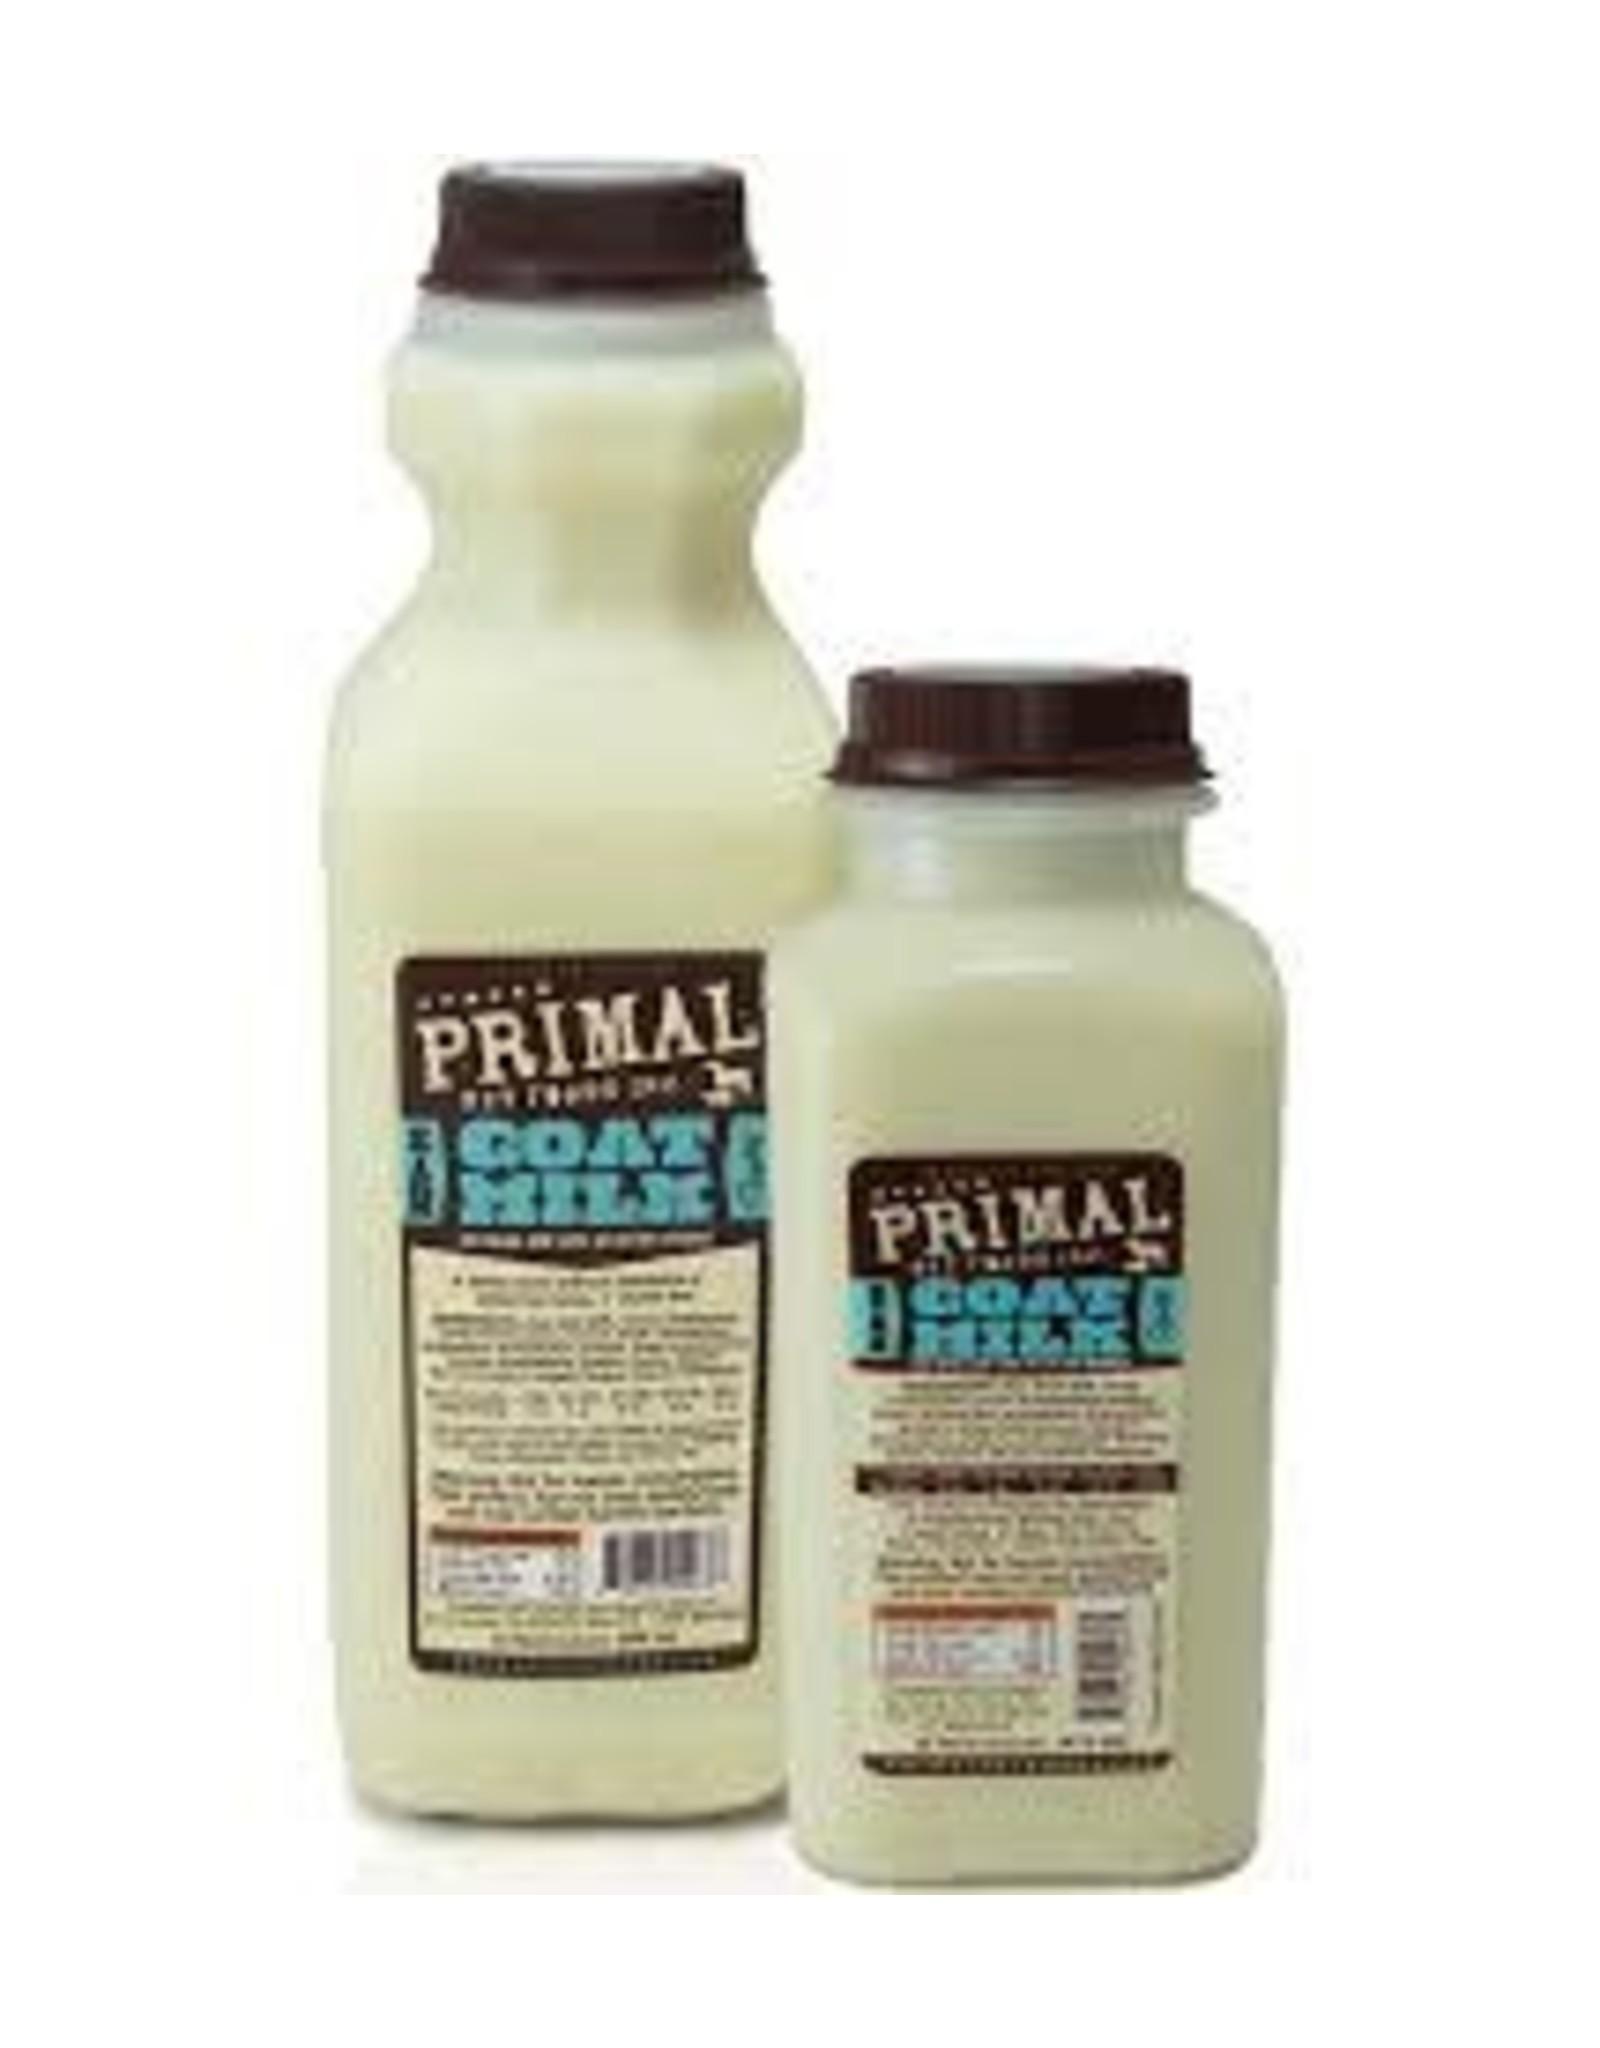 PRIMAL PRIMAL RAW GOATS MILK PINT